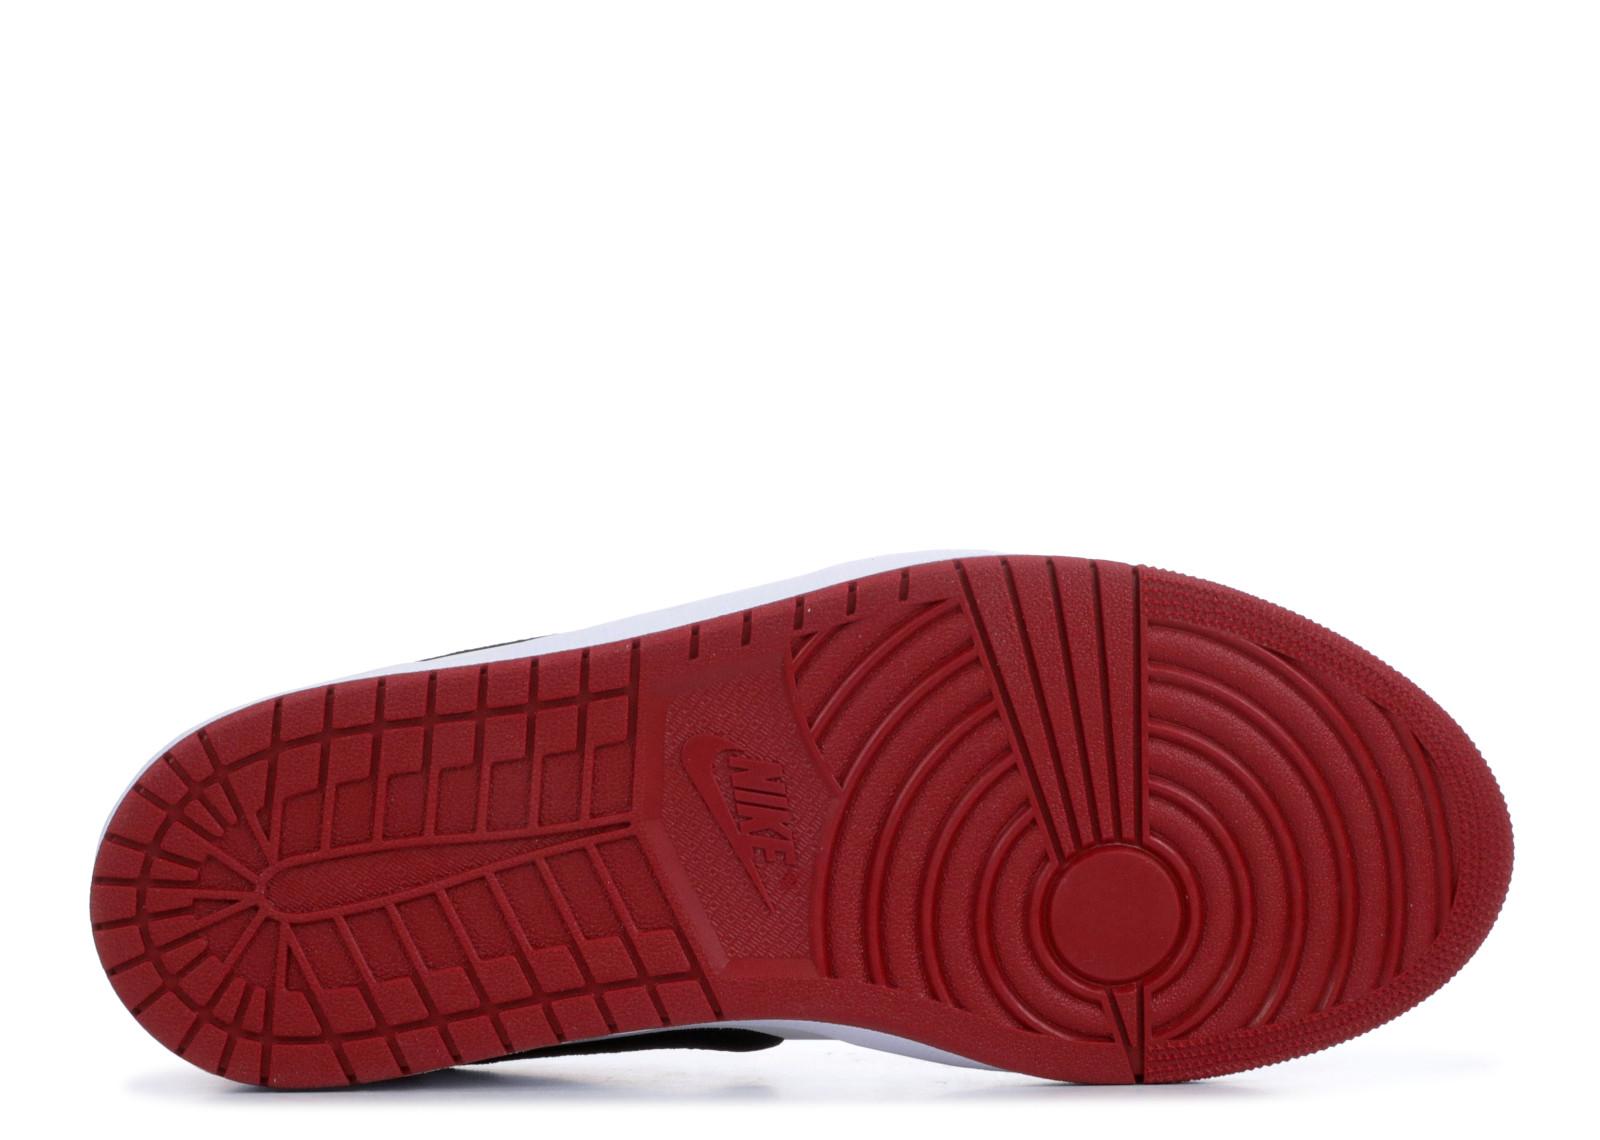 a1dfe4b82 Jordan 1 Retro Low Slip Chicago (W) - 4